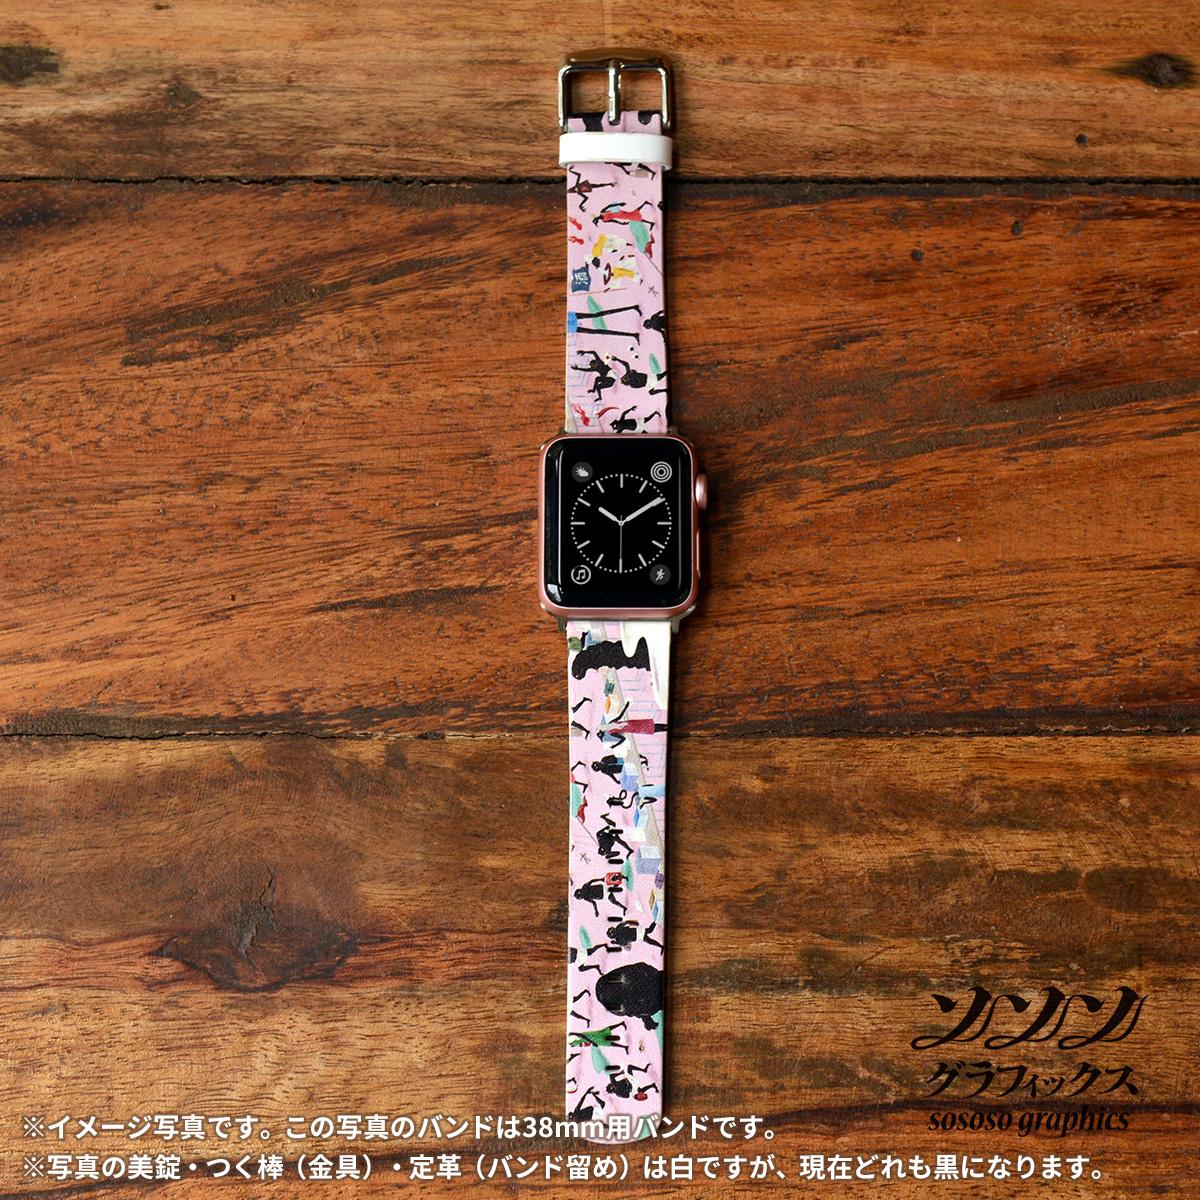 Apple Watch バンド アップルウォッチ ベルト 革 アップルウォッチ3 アップルウォッチ バンド レザー ばけものづくし 妖怪本市/sososo graphics